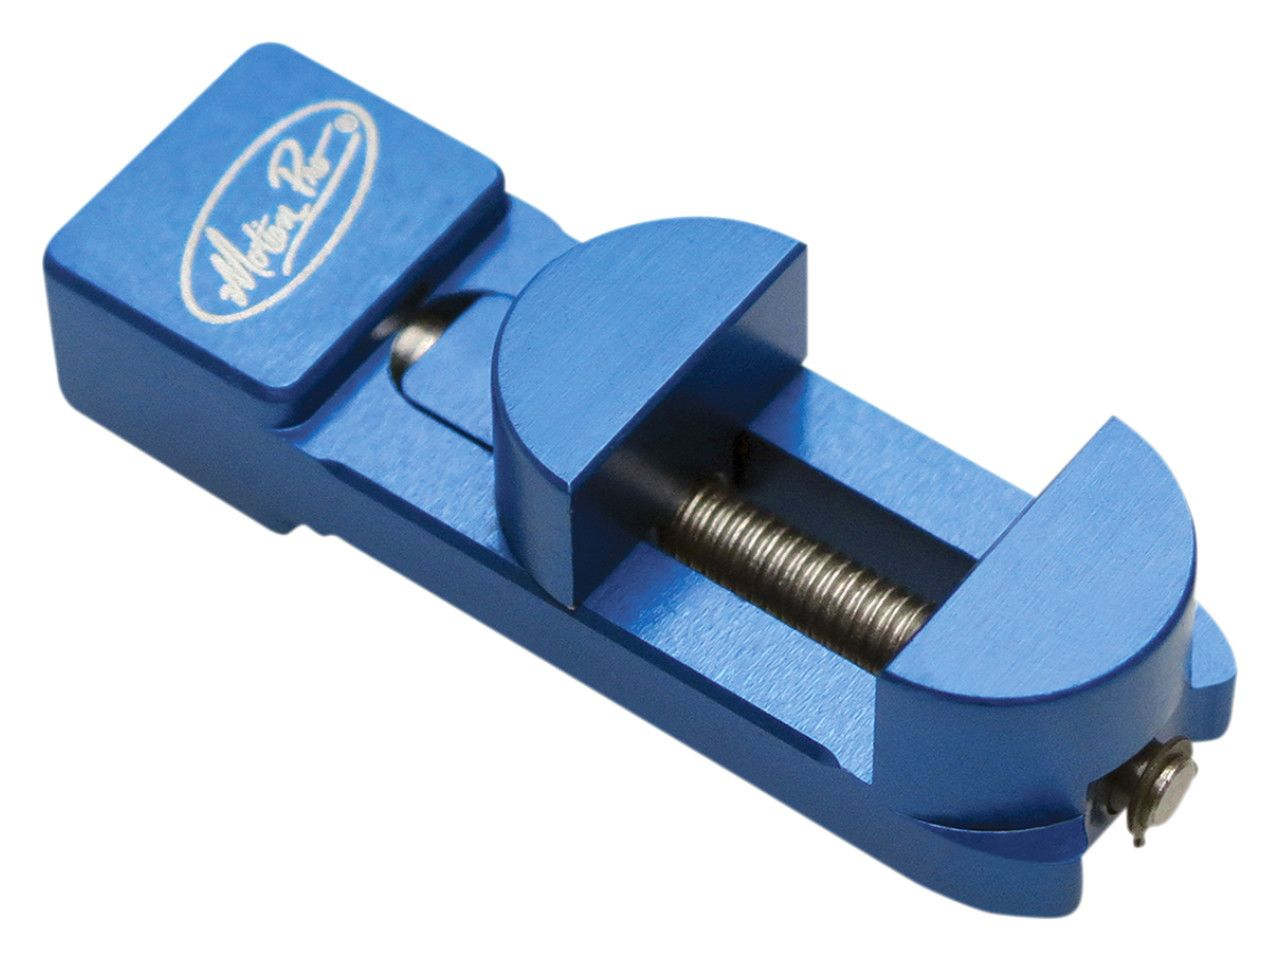 Motion Pro Brake Caliper Piston Tool